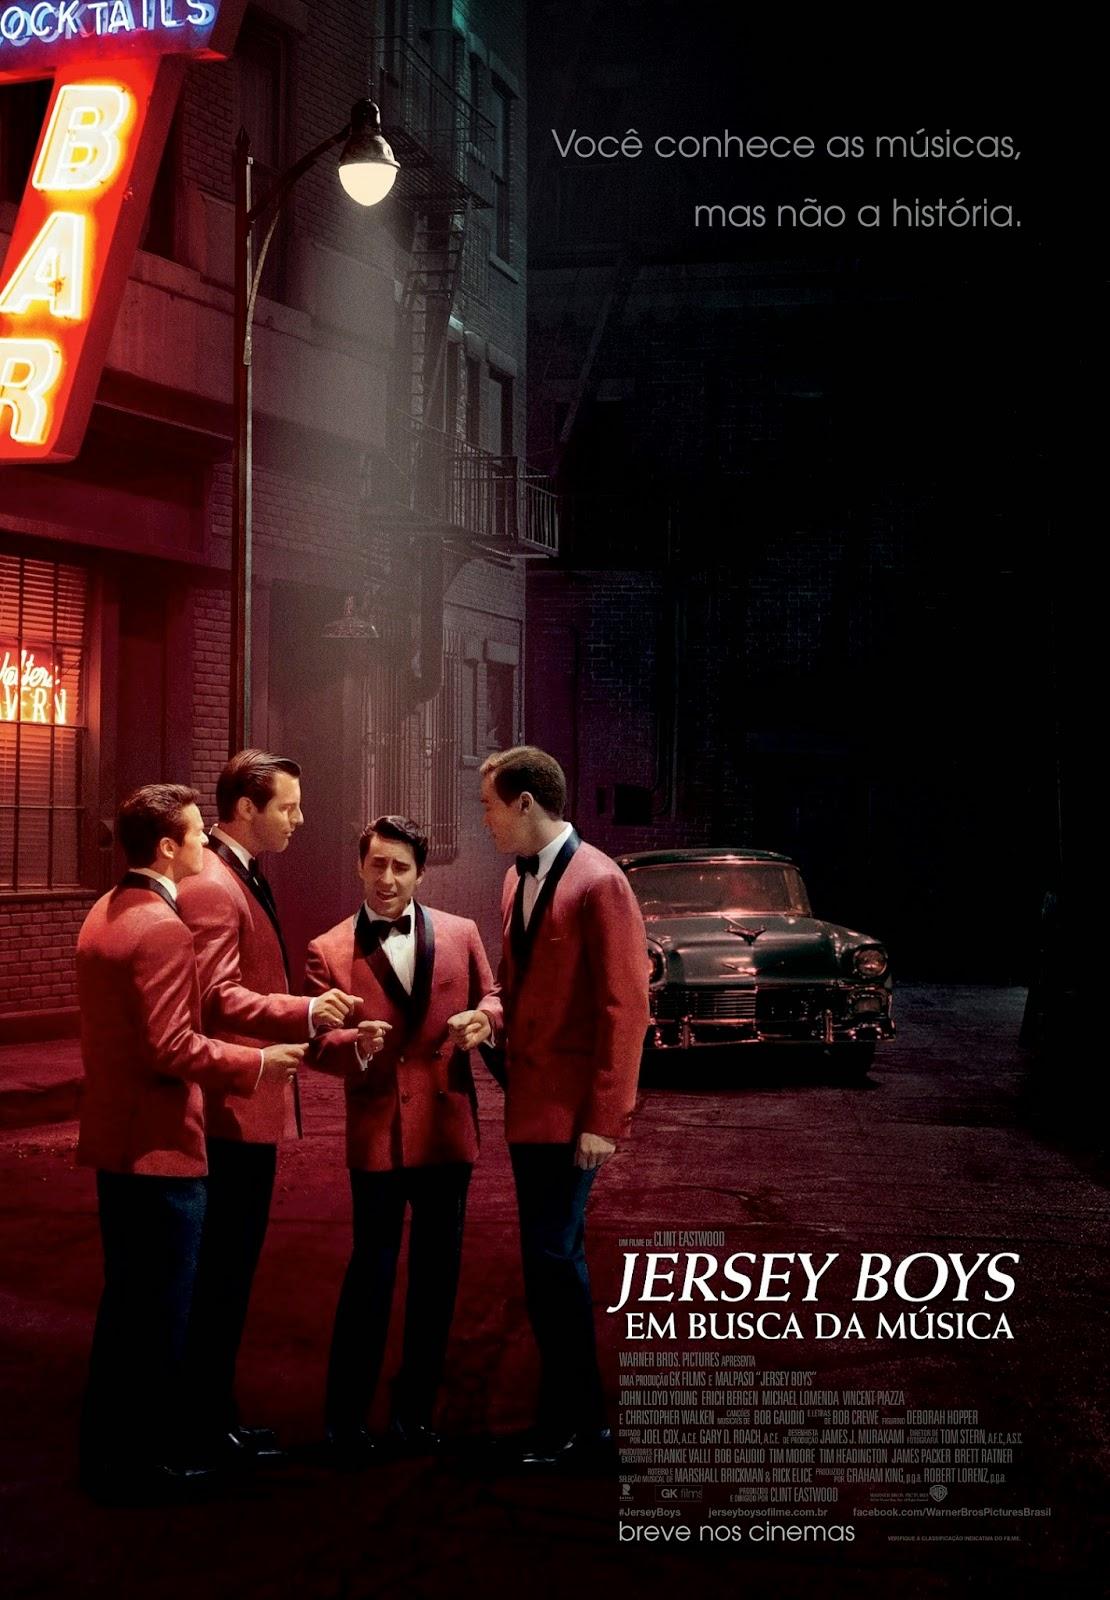 Pôster/capa/cartaz nacional de JERSEY BOYS: EM BUSCA DA MÚSICA (Jersey Boys)